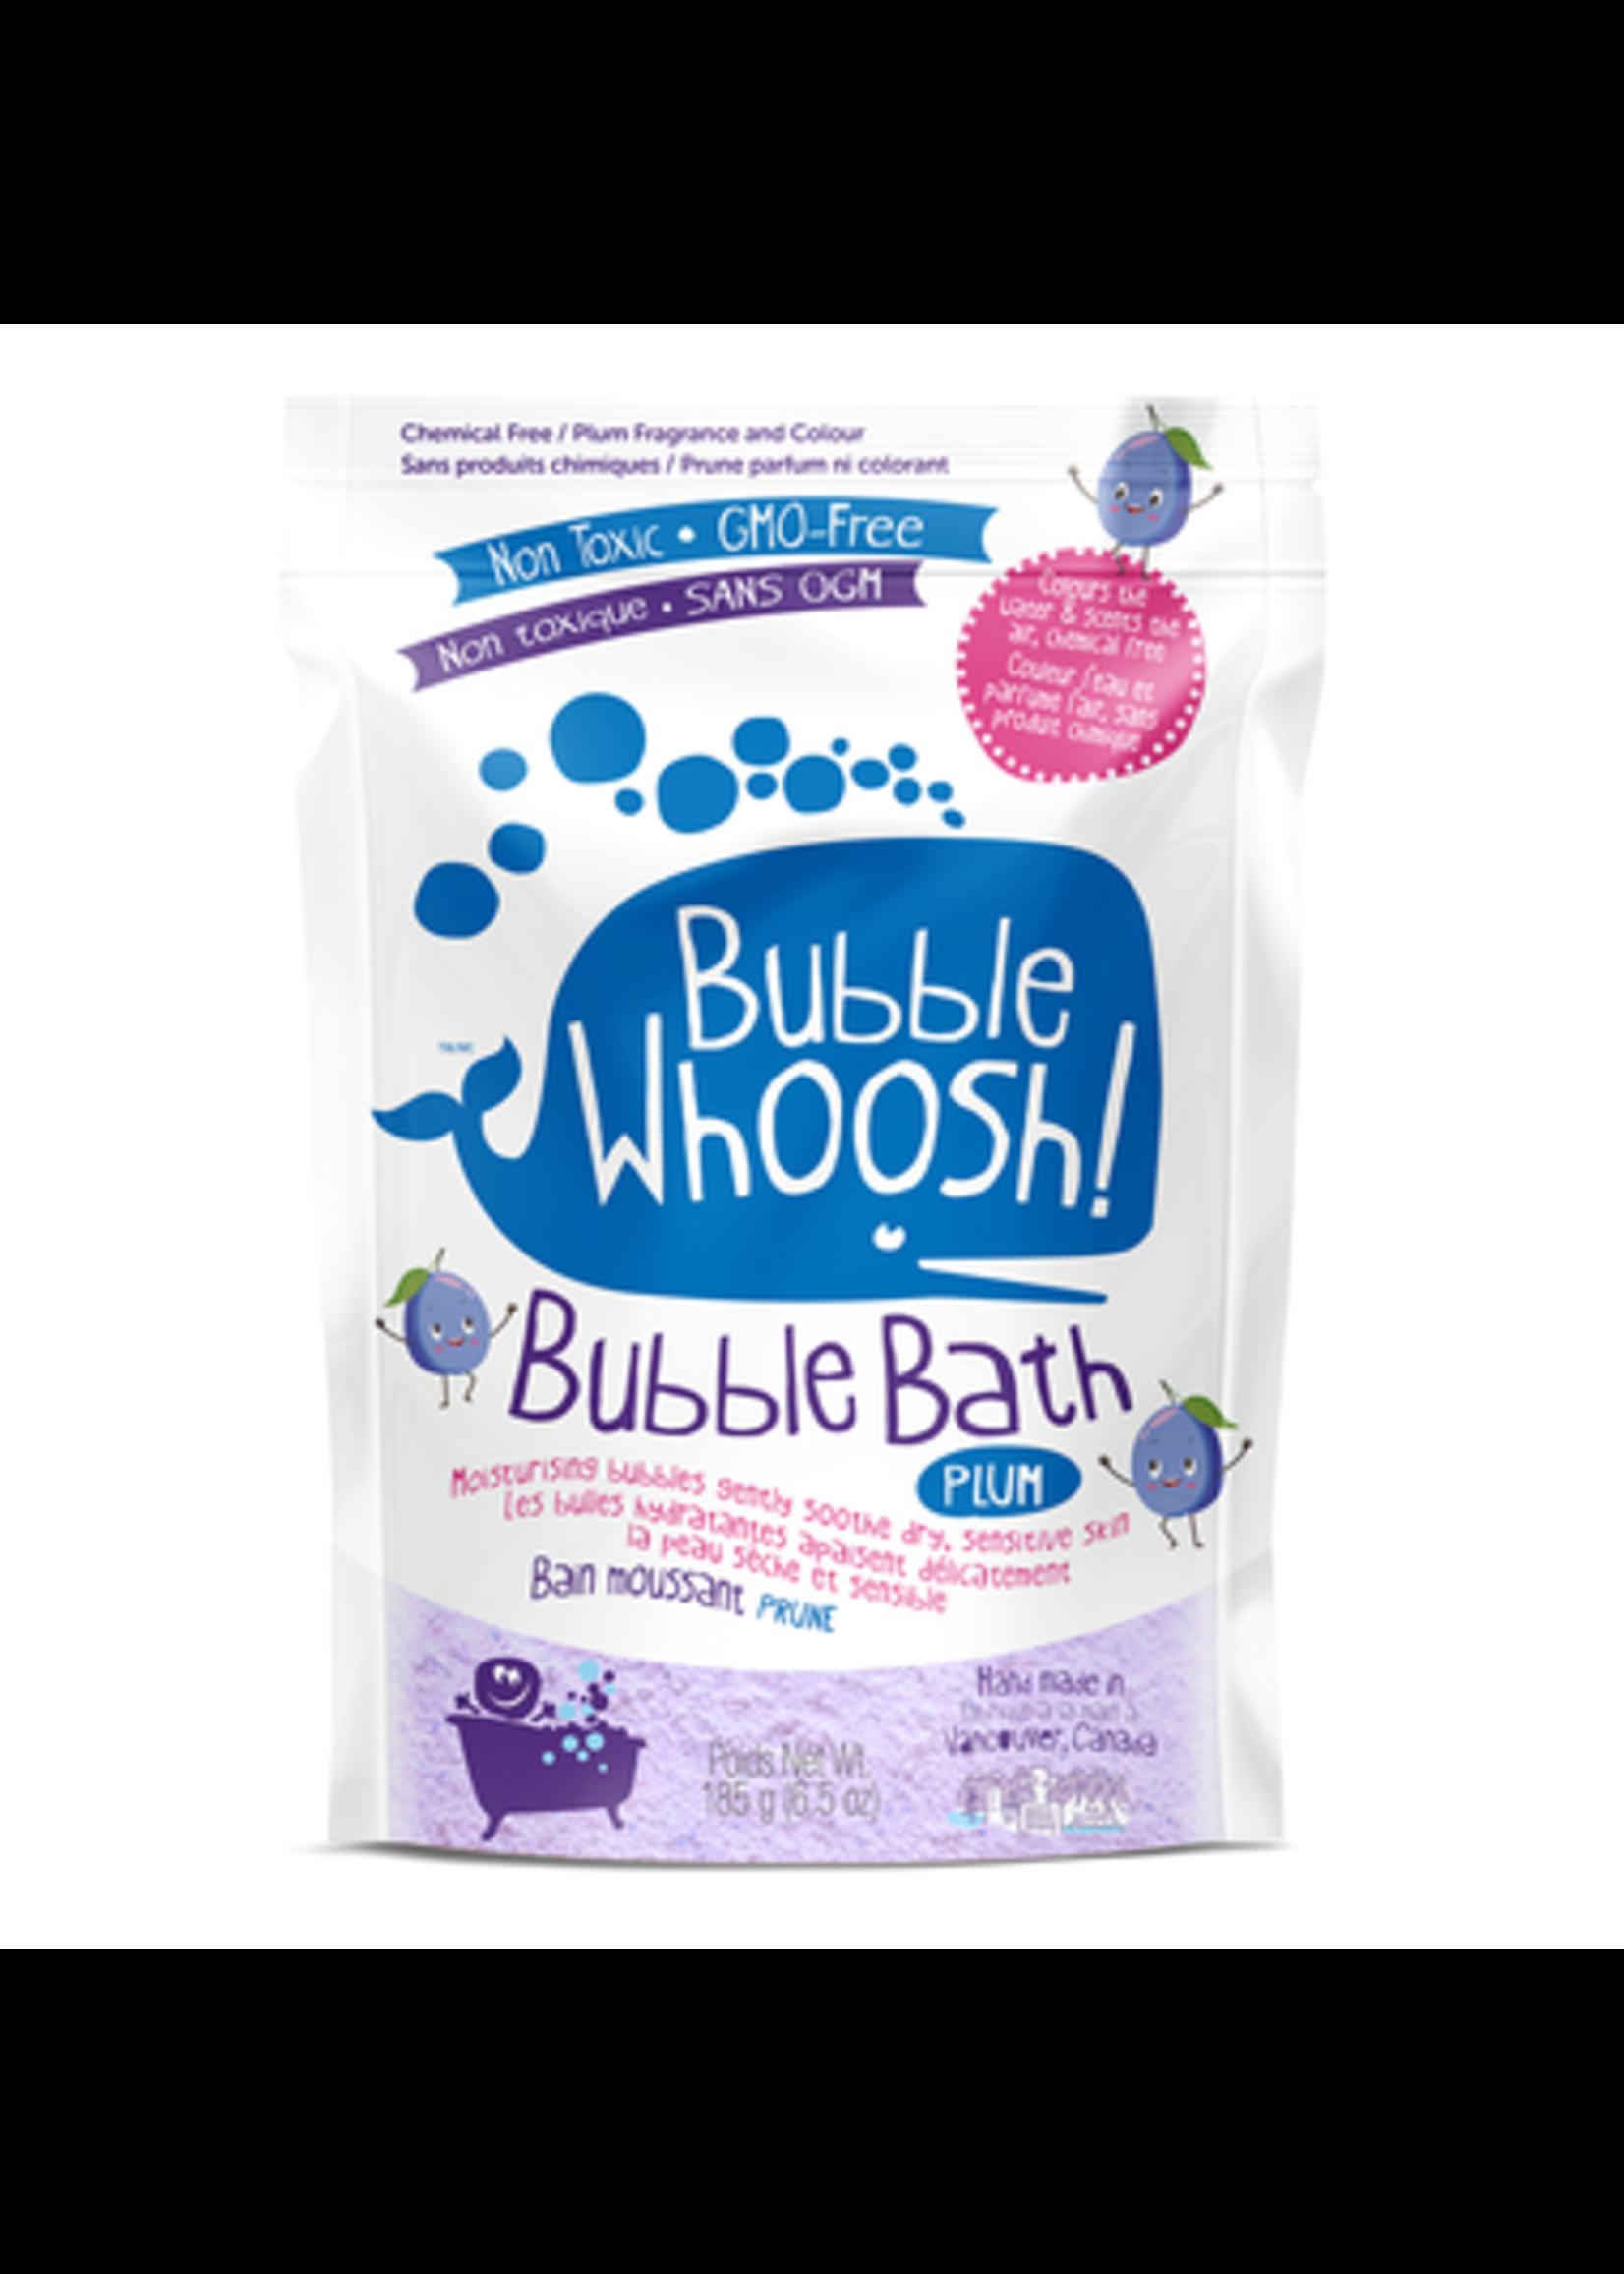 Bubble Whoosh Bubble Whoosh Bubble Bath (Plum)